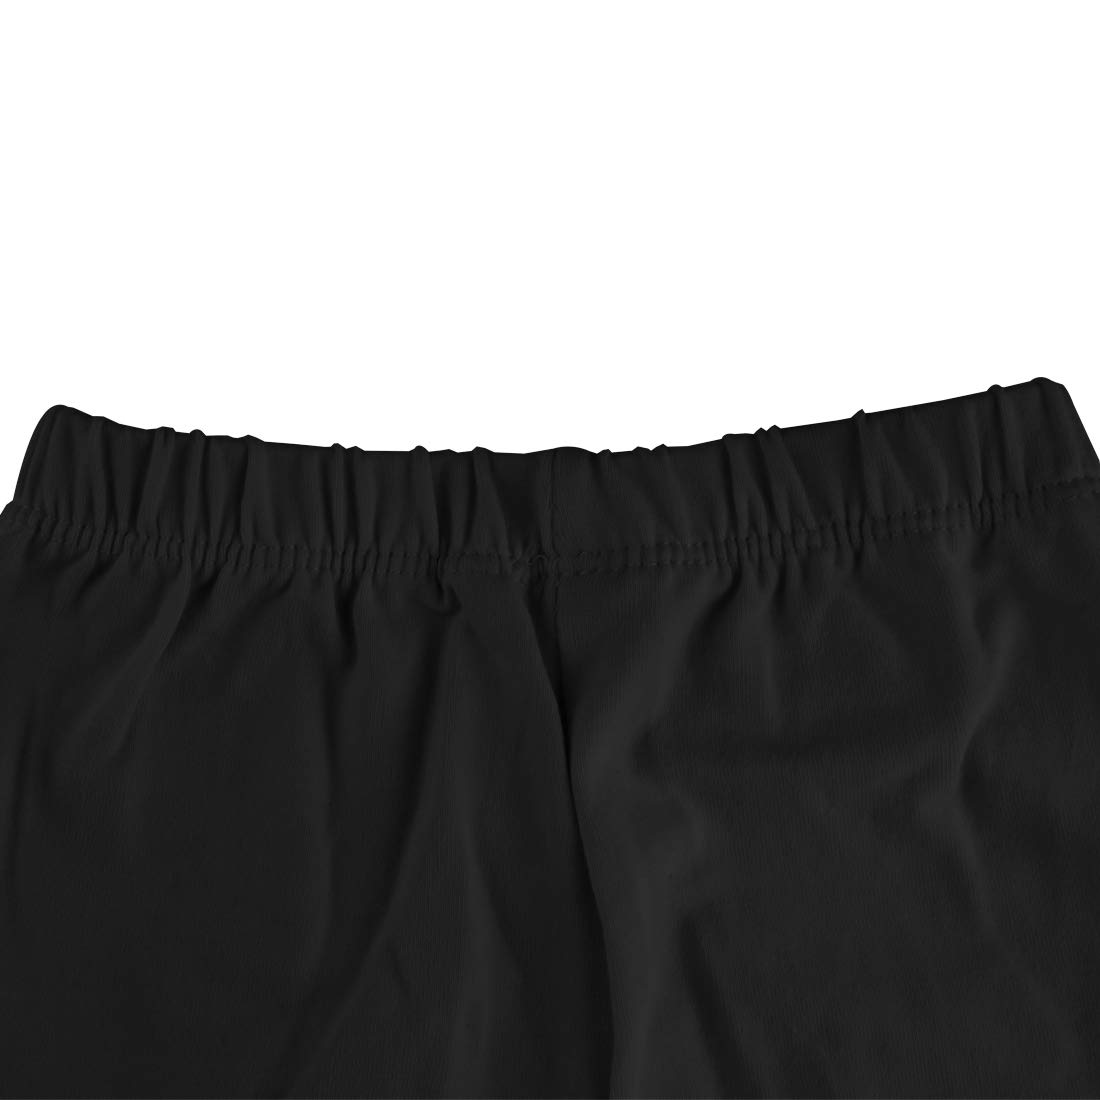 Larcele Pantaloni da Ballo per Bambini ETWDK-01